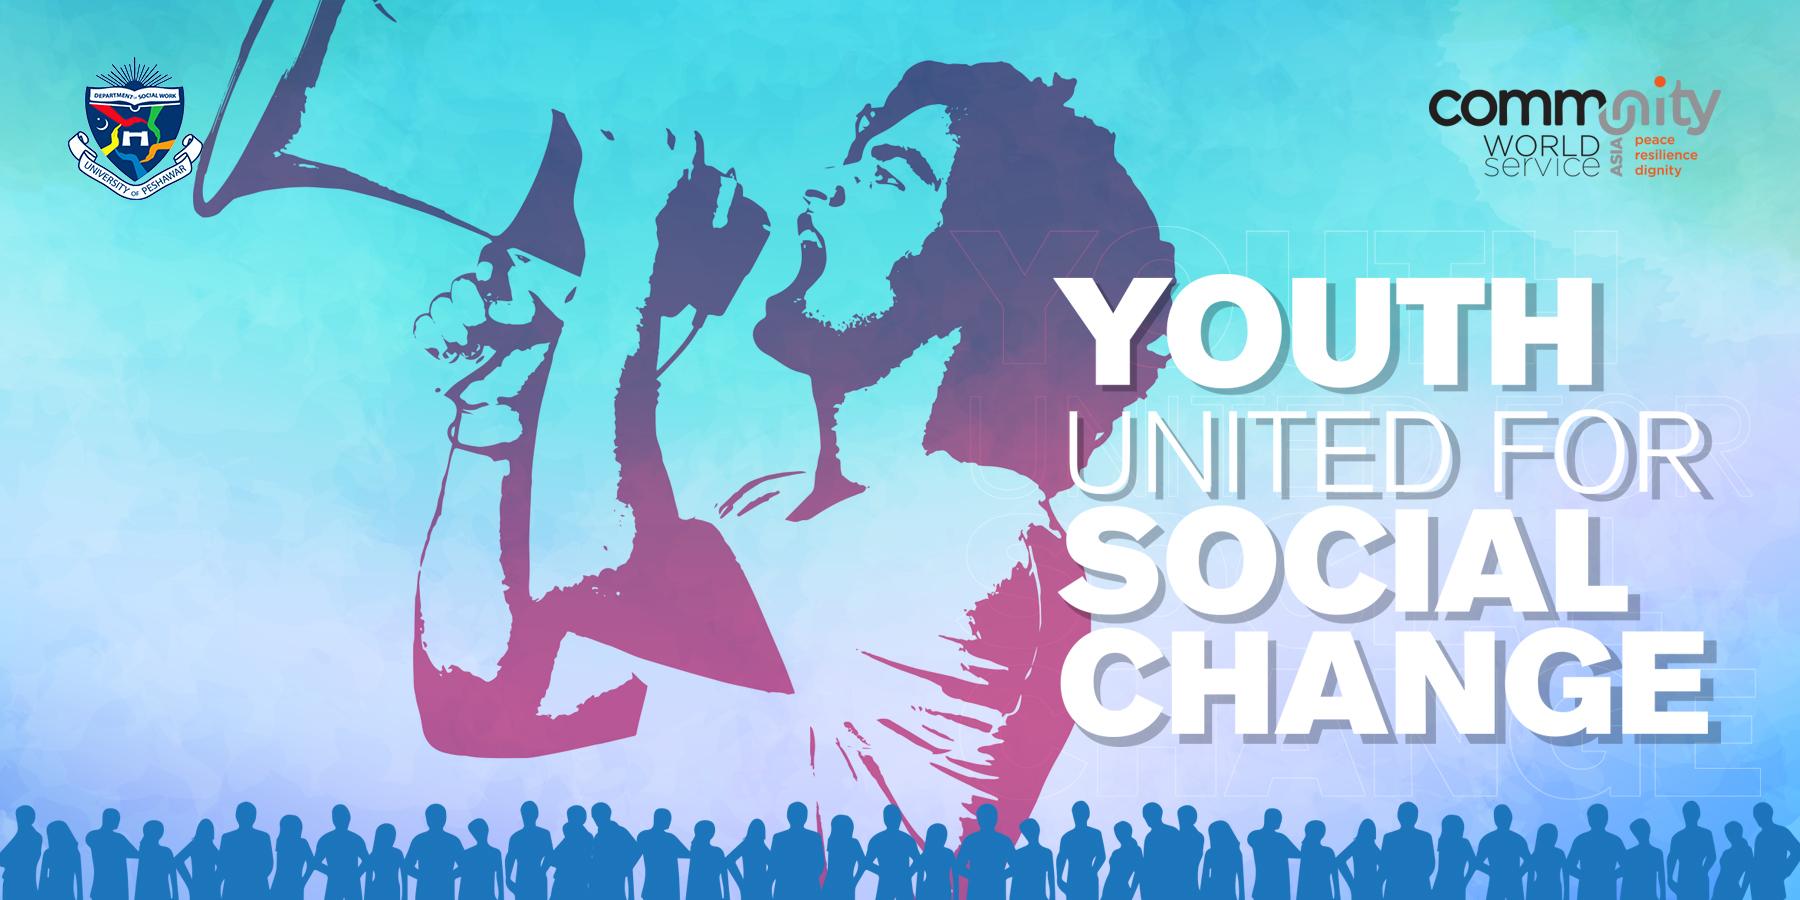 Workshop on Youth United for Social Change